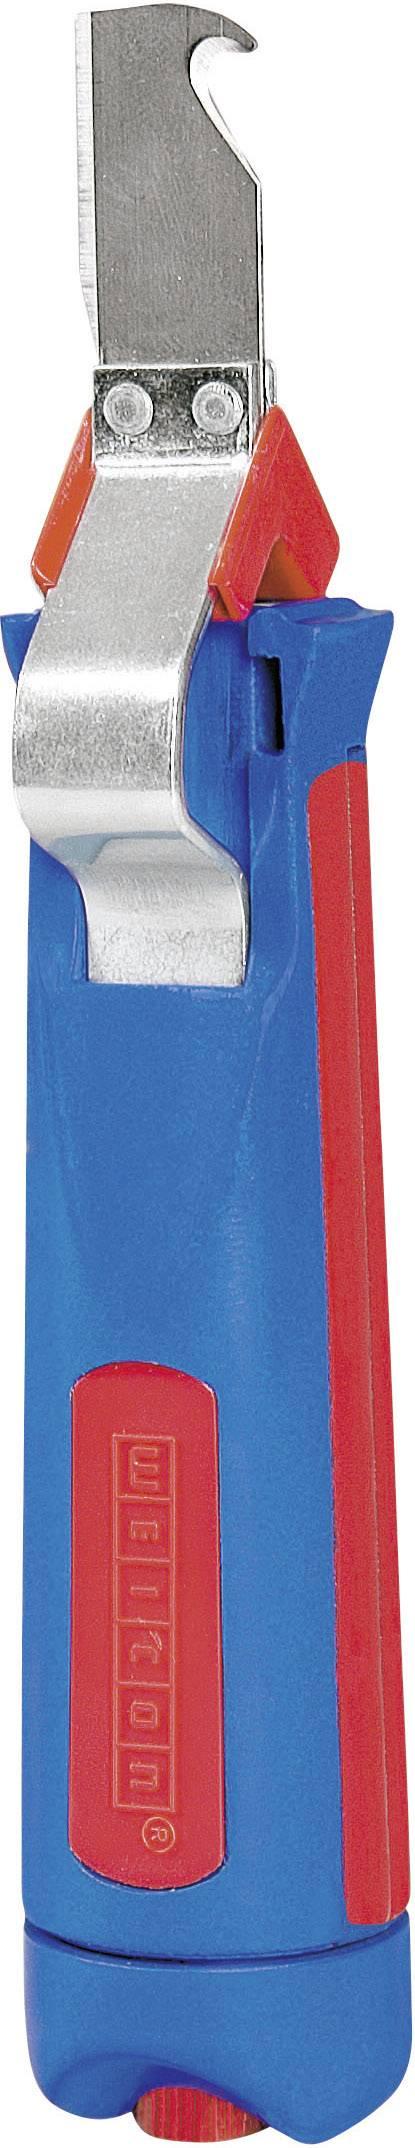 Odizolvací nôž WEICON TOOLS 4-28 H 50054328, 4 do 28 mm